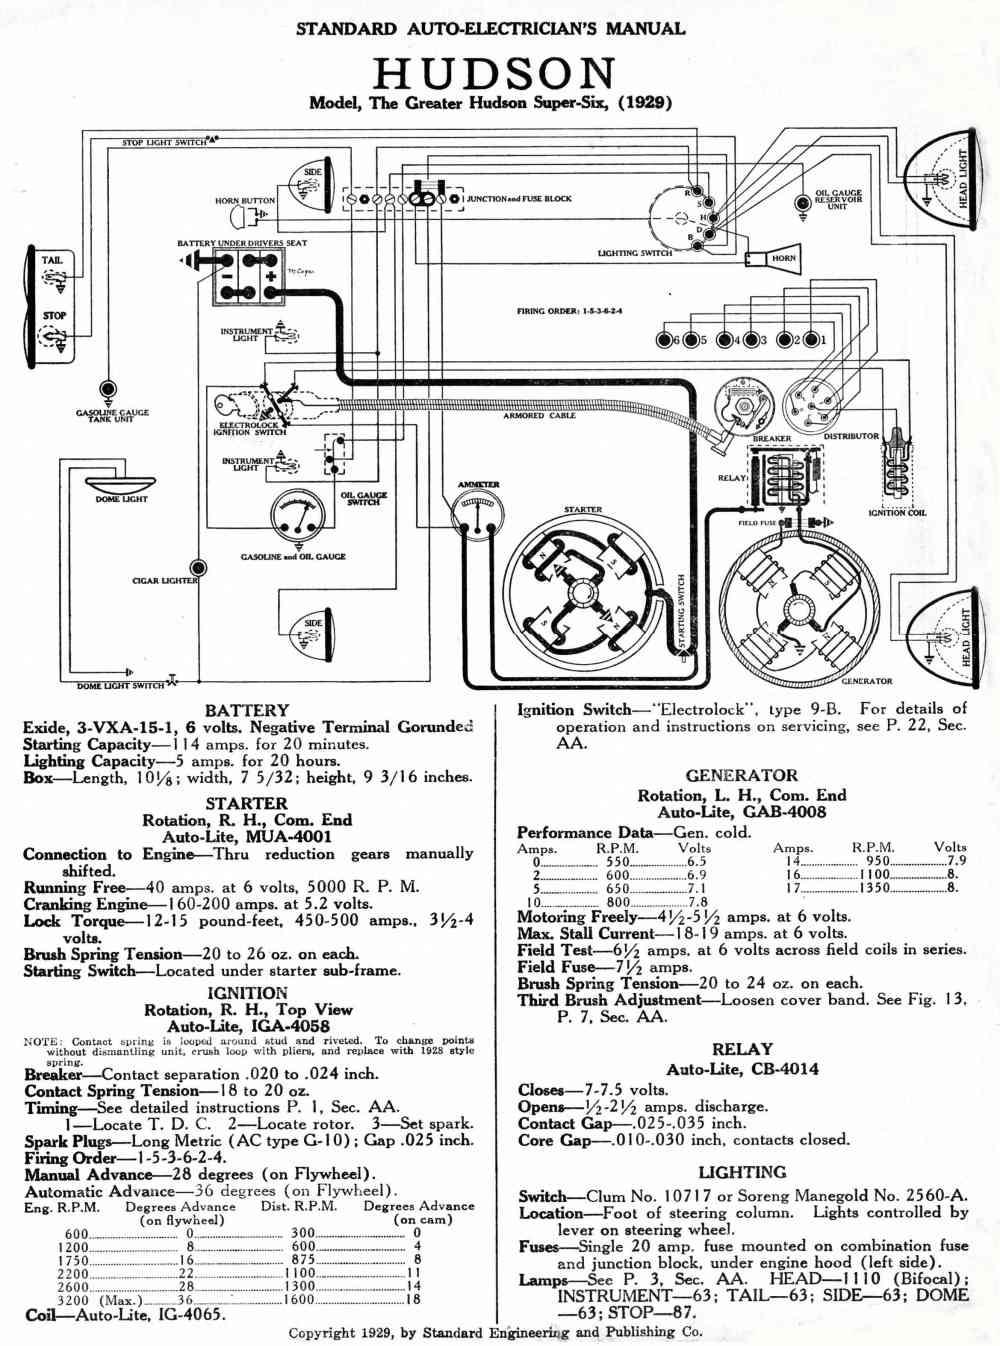 medium resolution of 1950 hudson wiring diagram wiring diagrams long 1947 hudson wiring harness